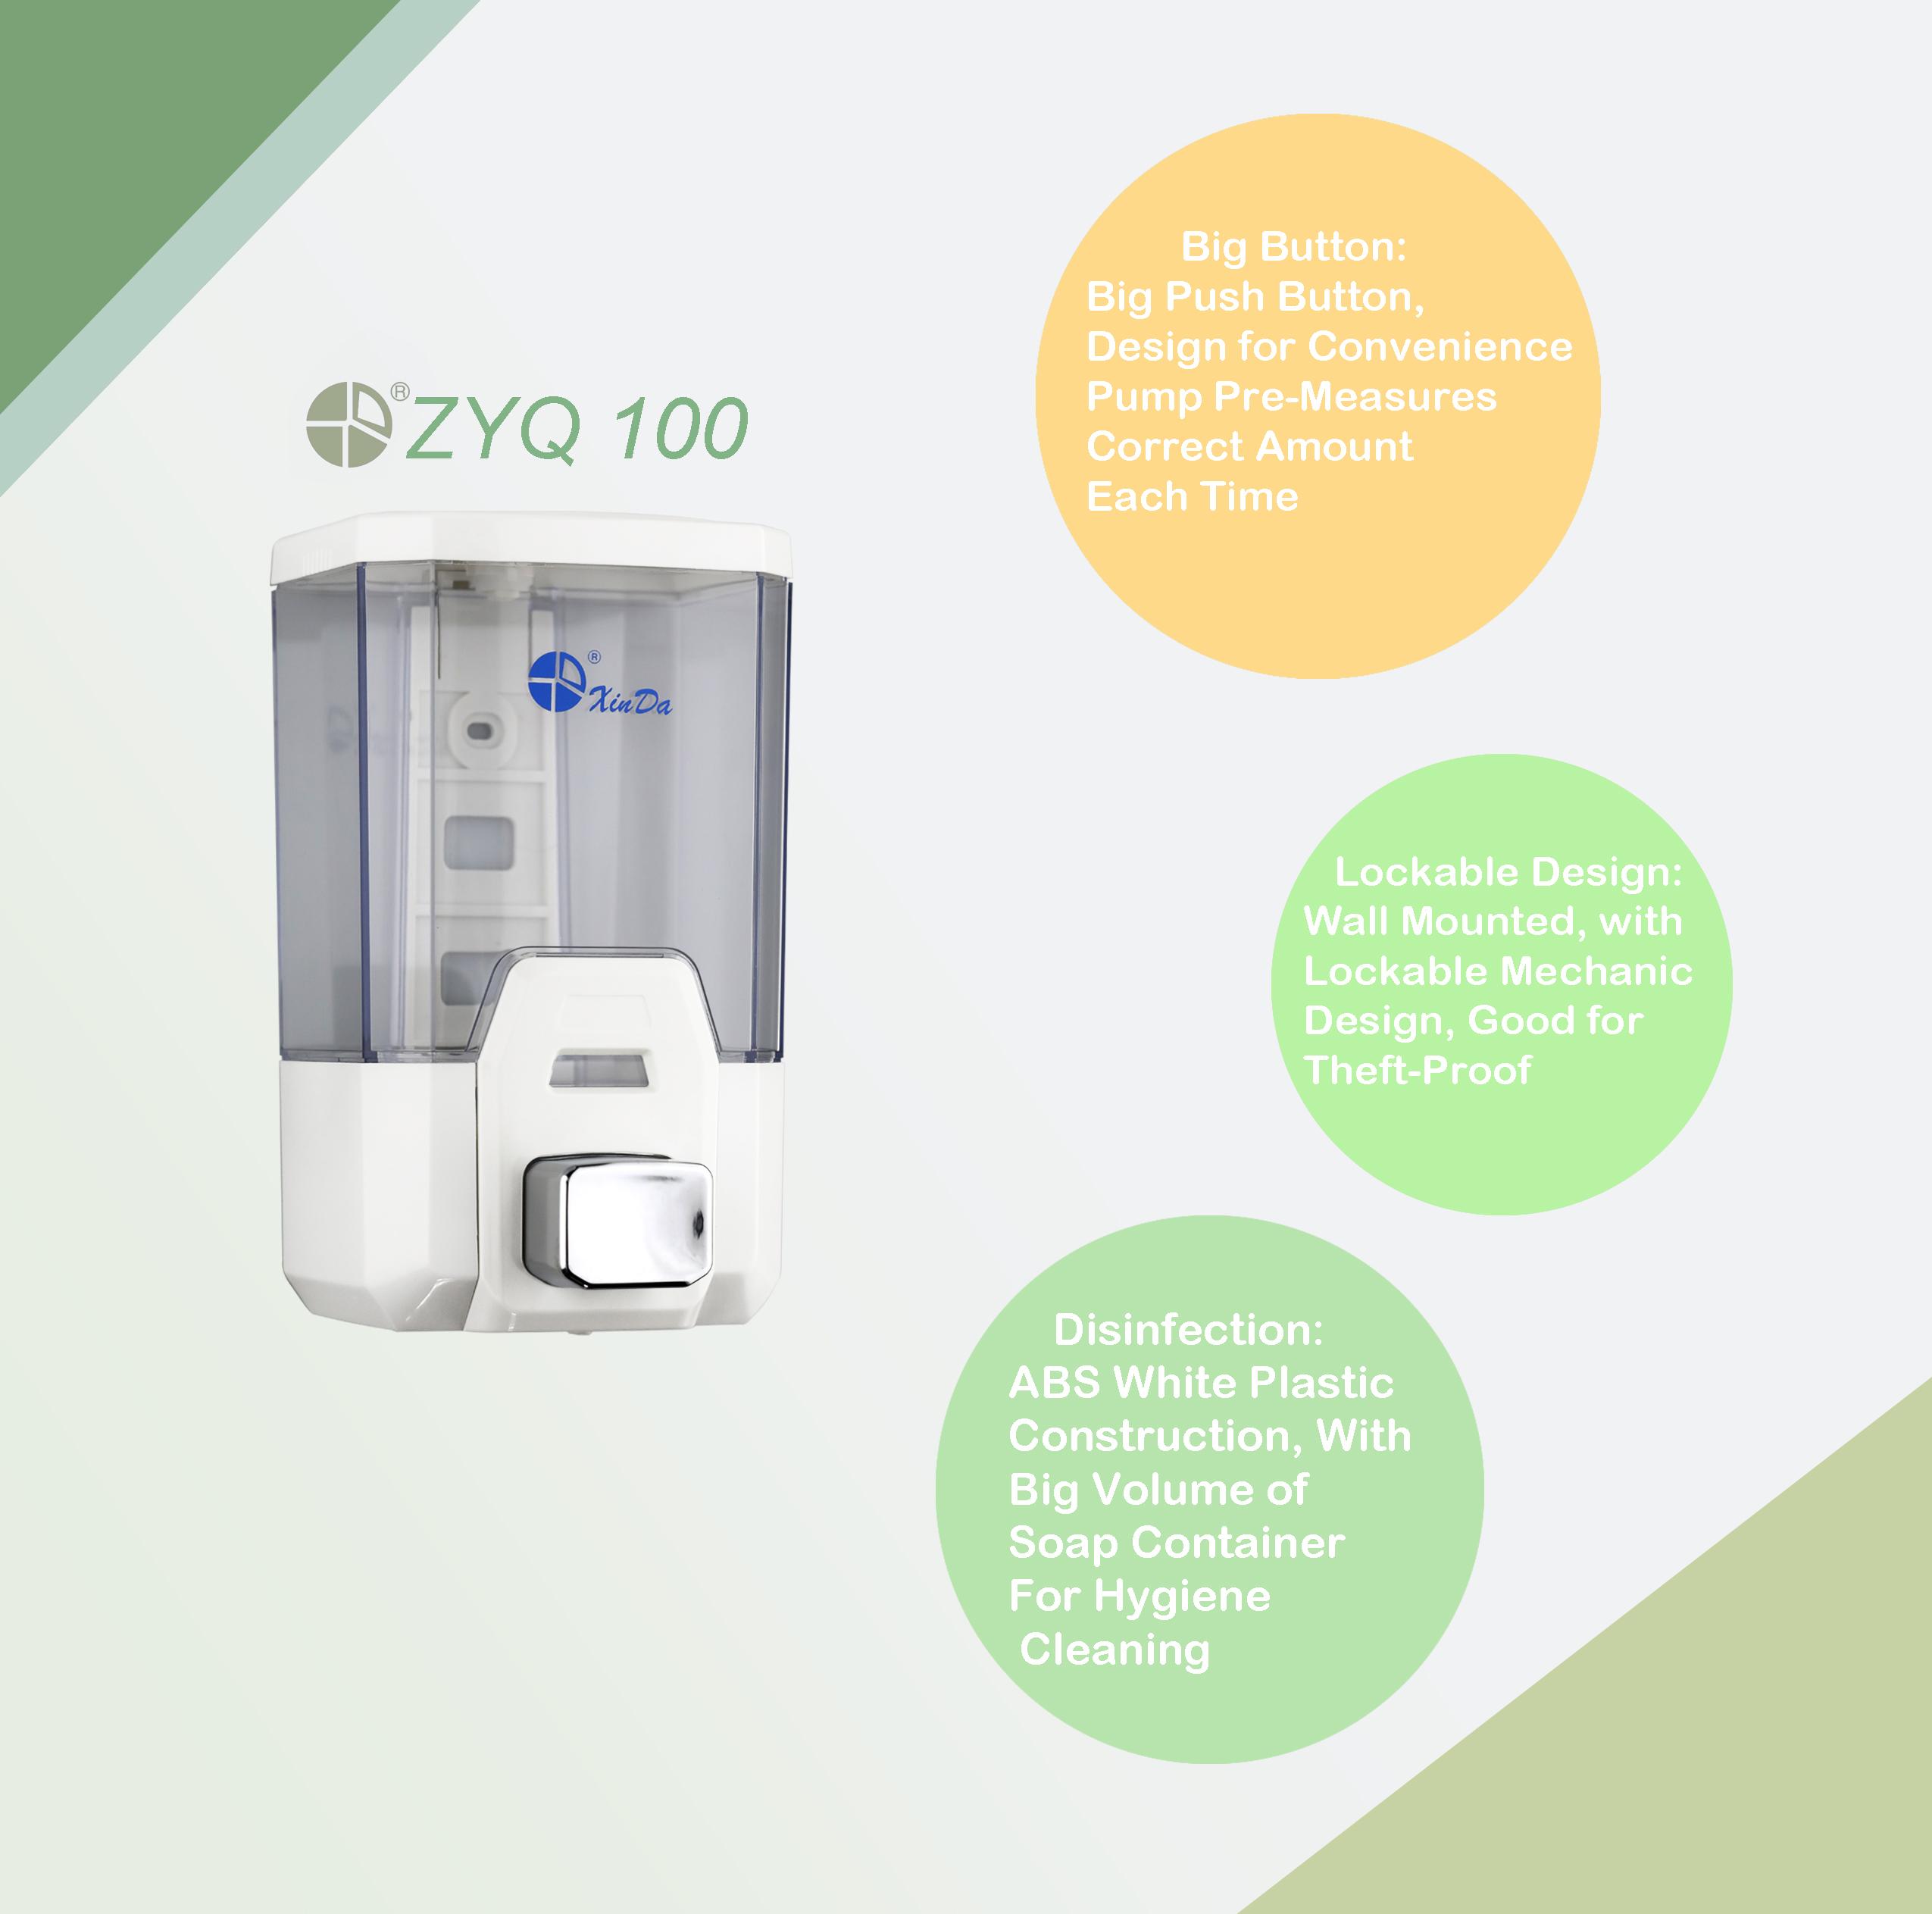 Infrared automatic sensor soap dispenser